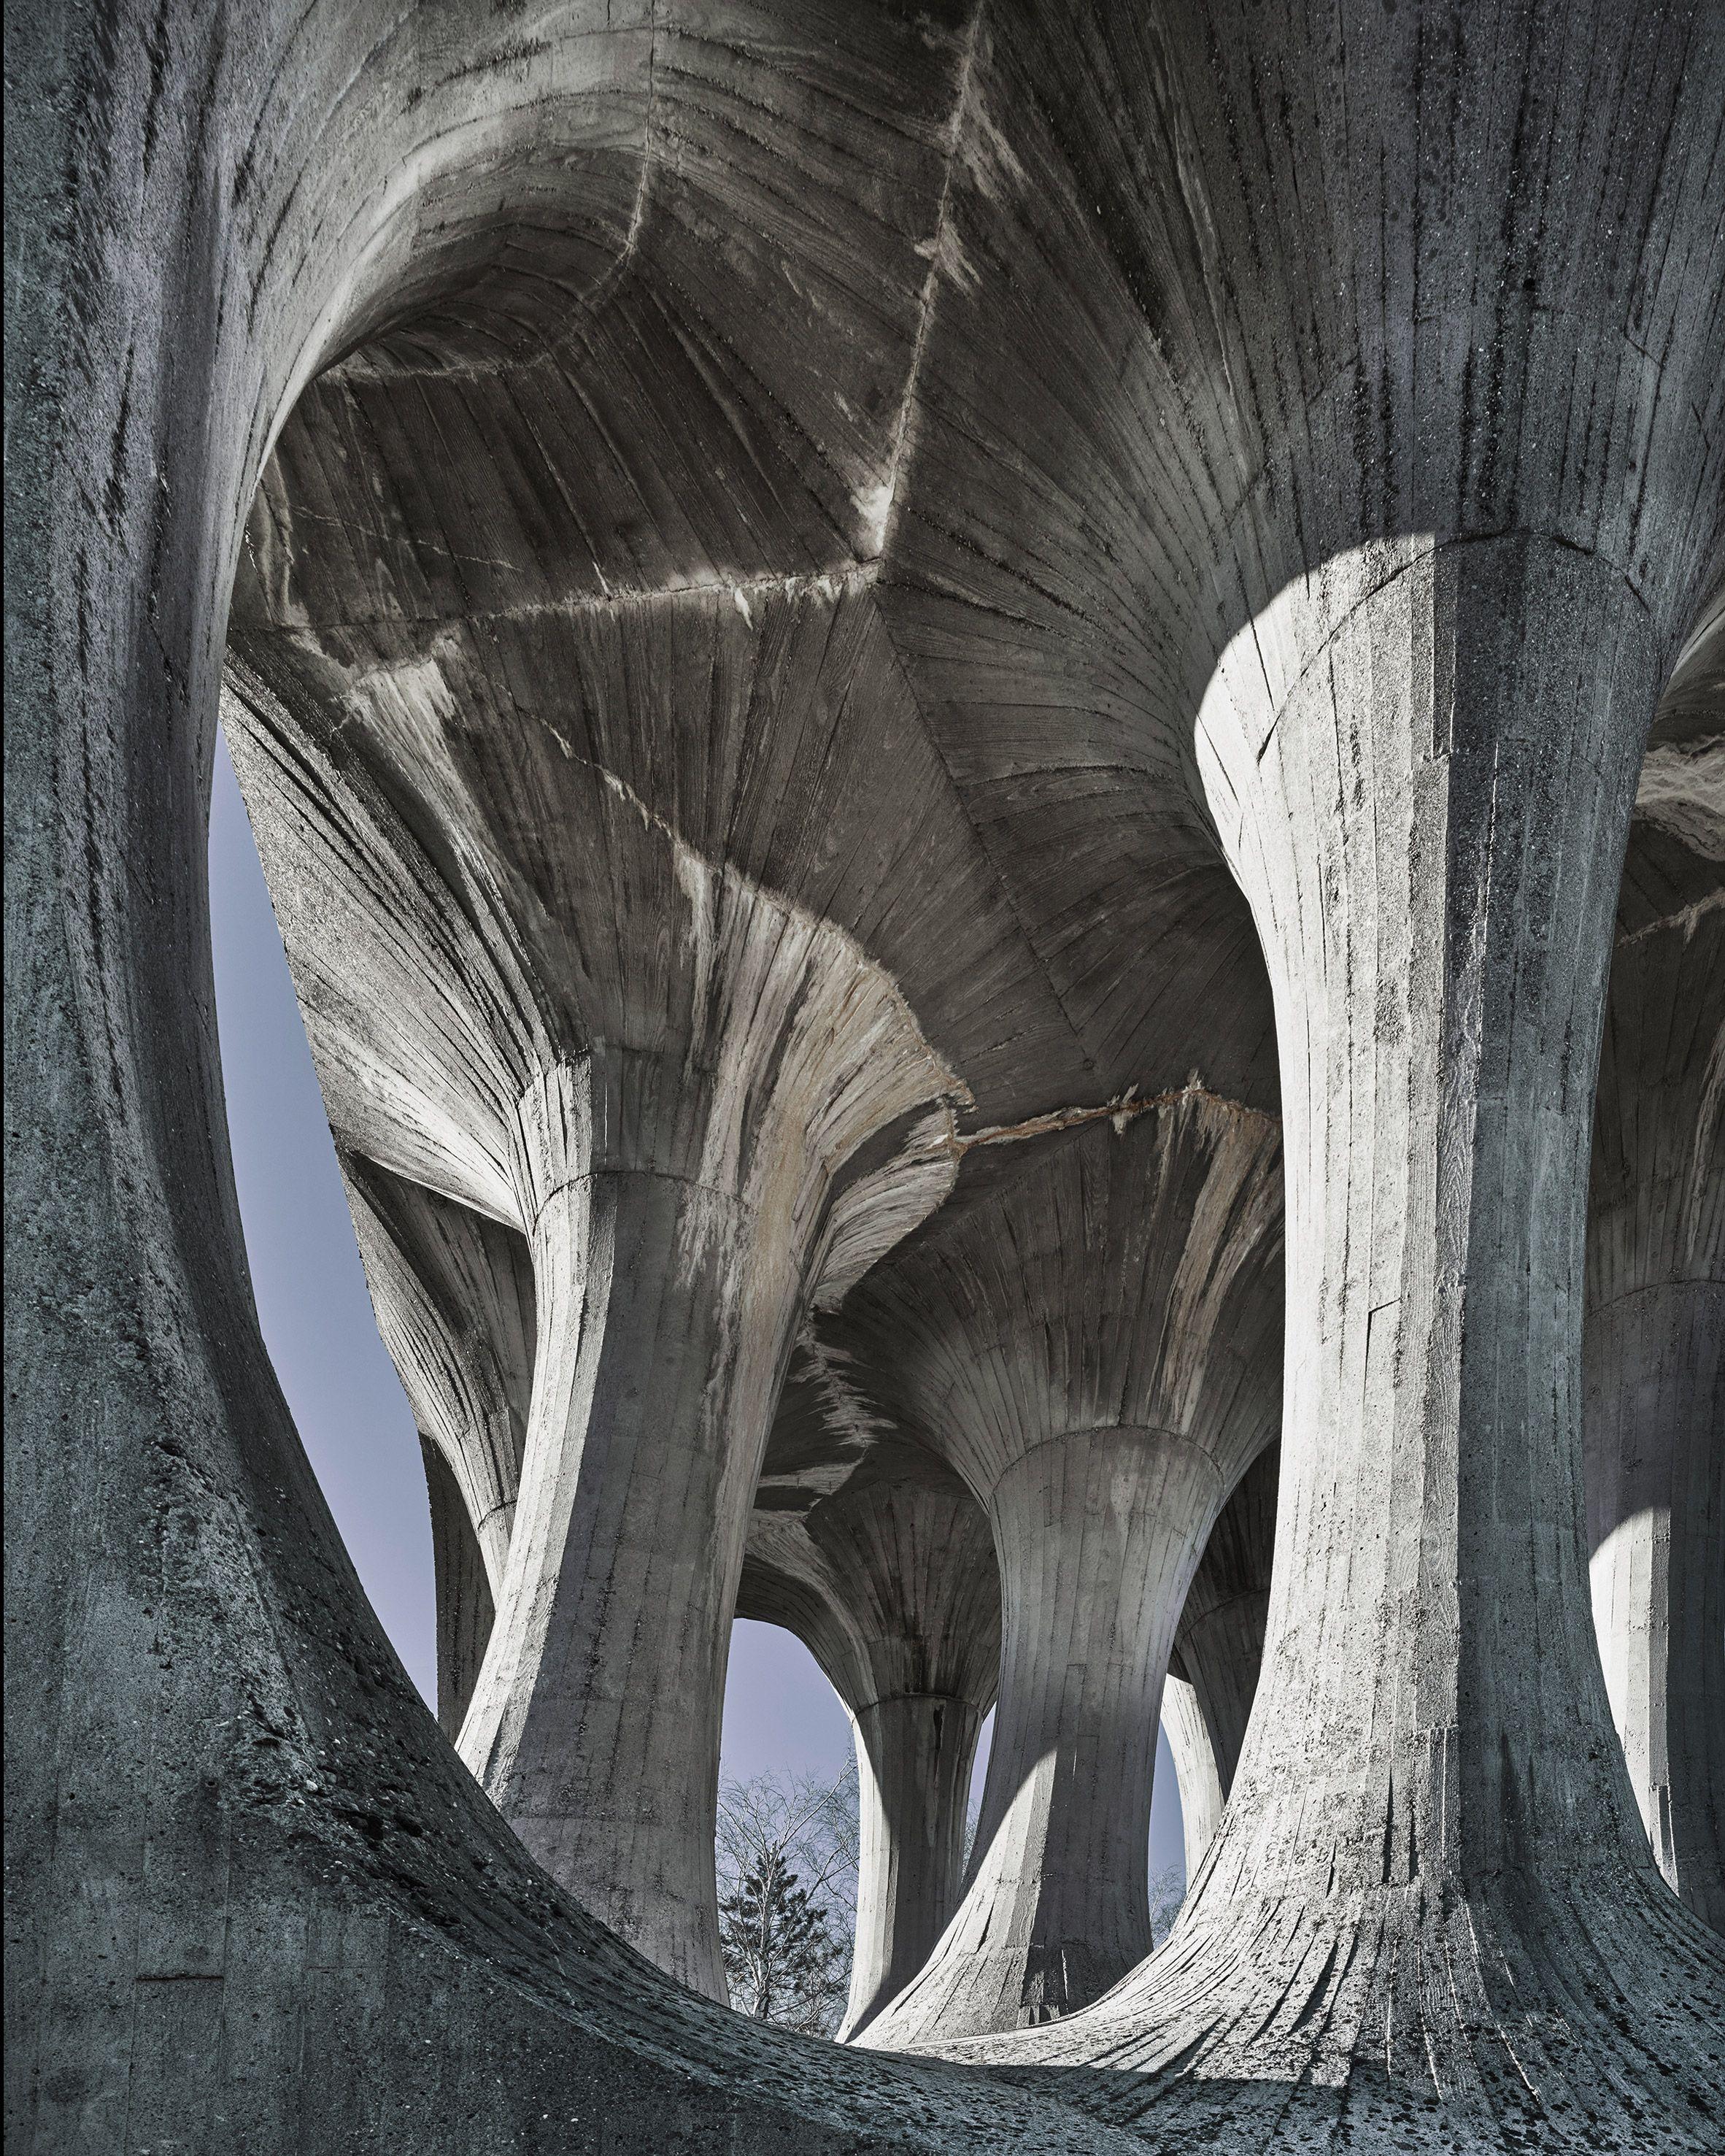 c601fd521553e Valentin Jeck photographs for MoMA's Toward a Concrete Utopia ...